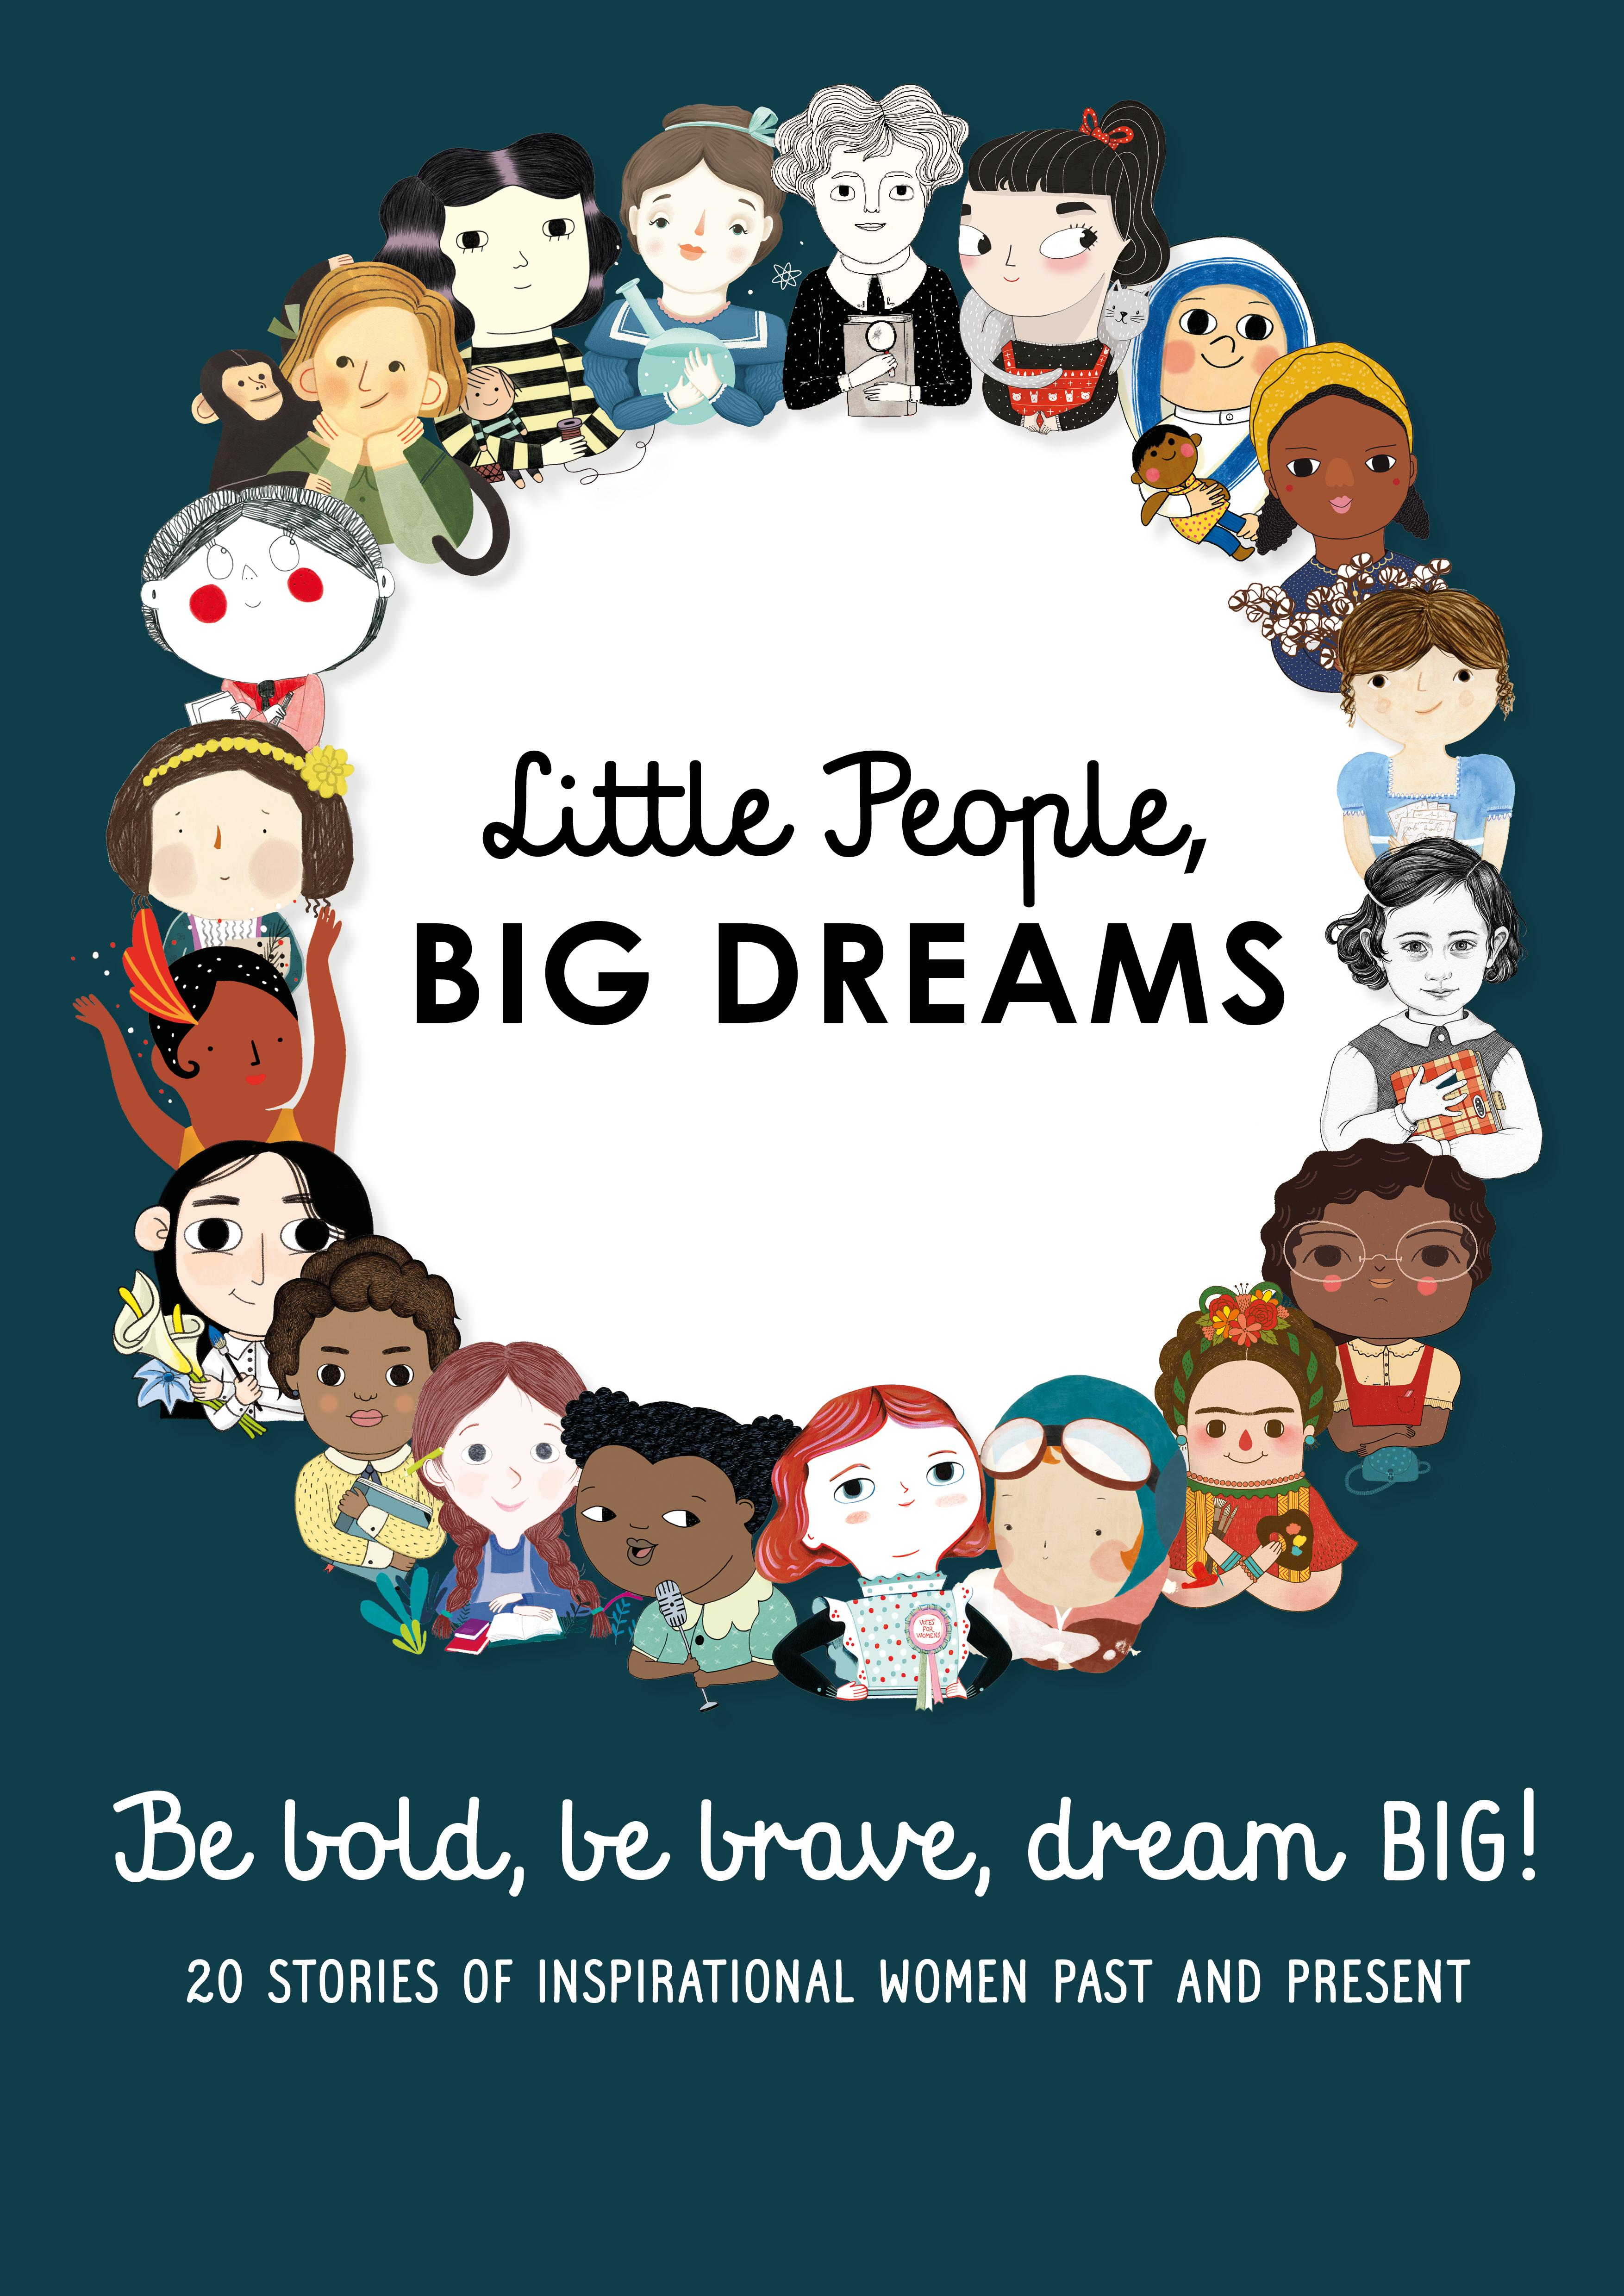 Coco Chanel (Little People, Big Dreams): Isabel Sanchez